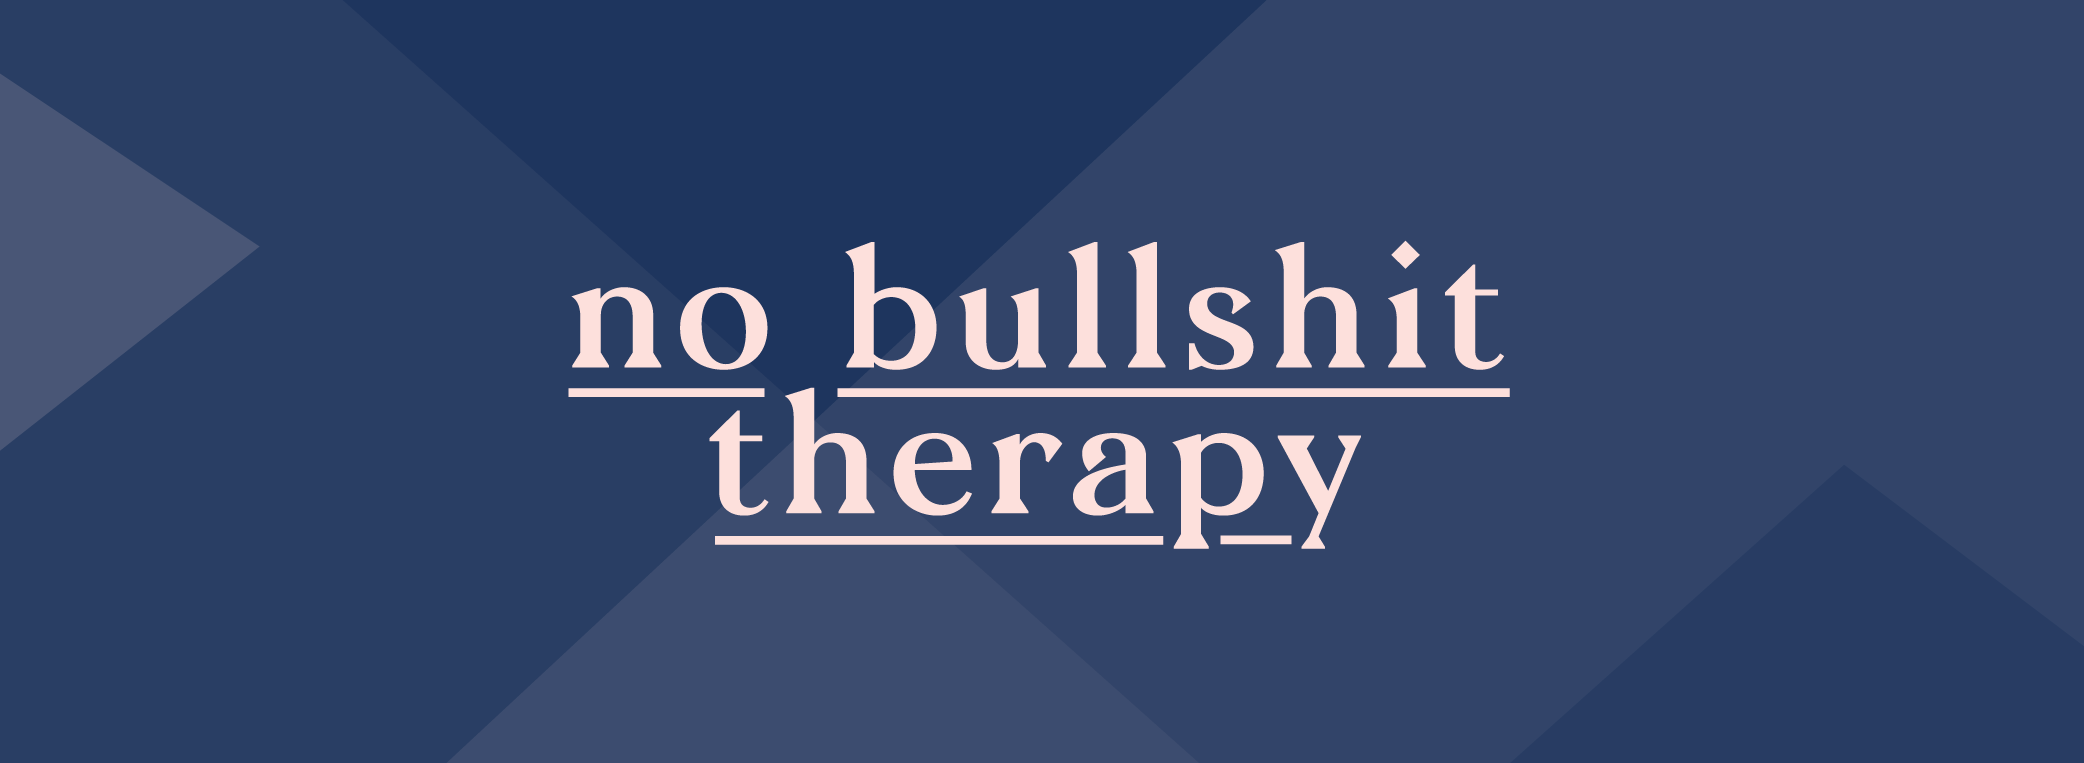 No Bullshit Therapy-06